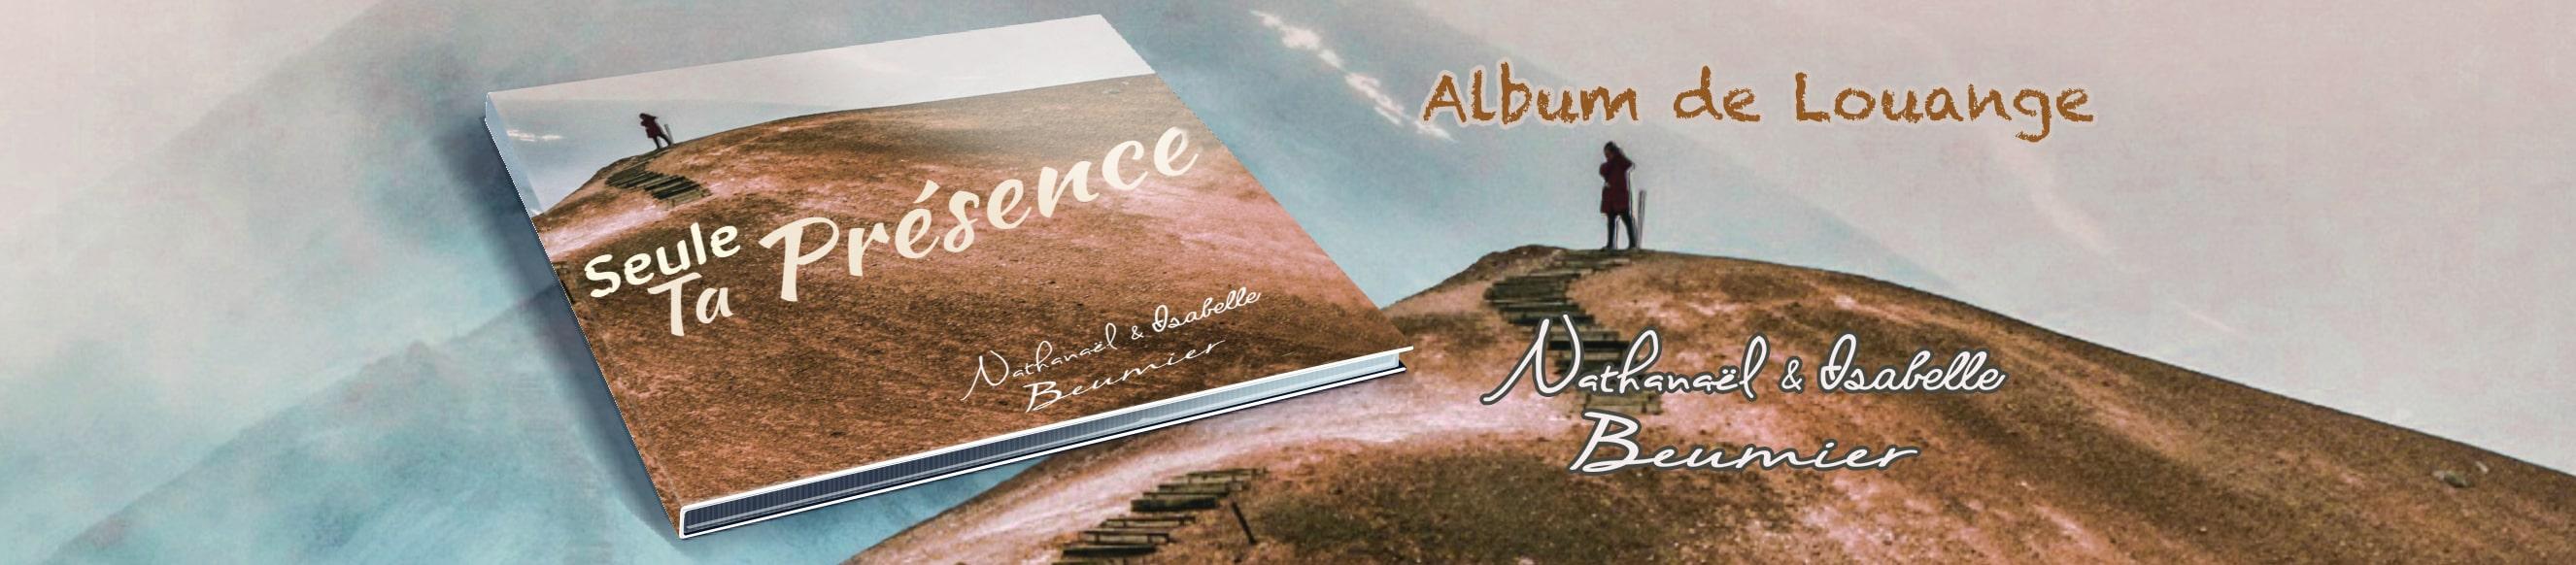 CD de louange Seule ta présence